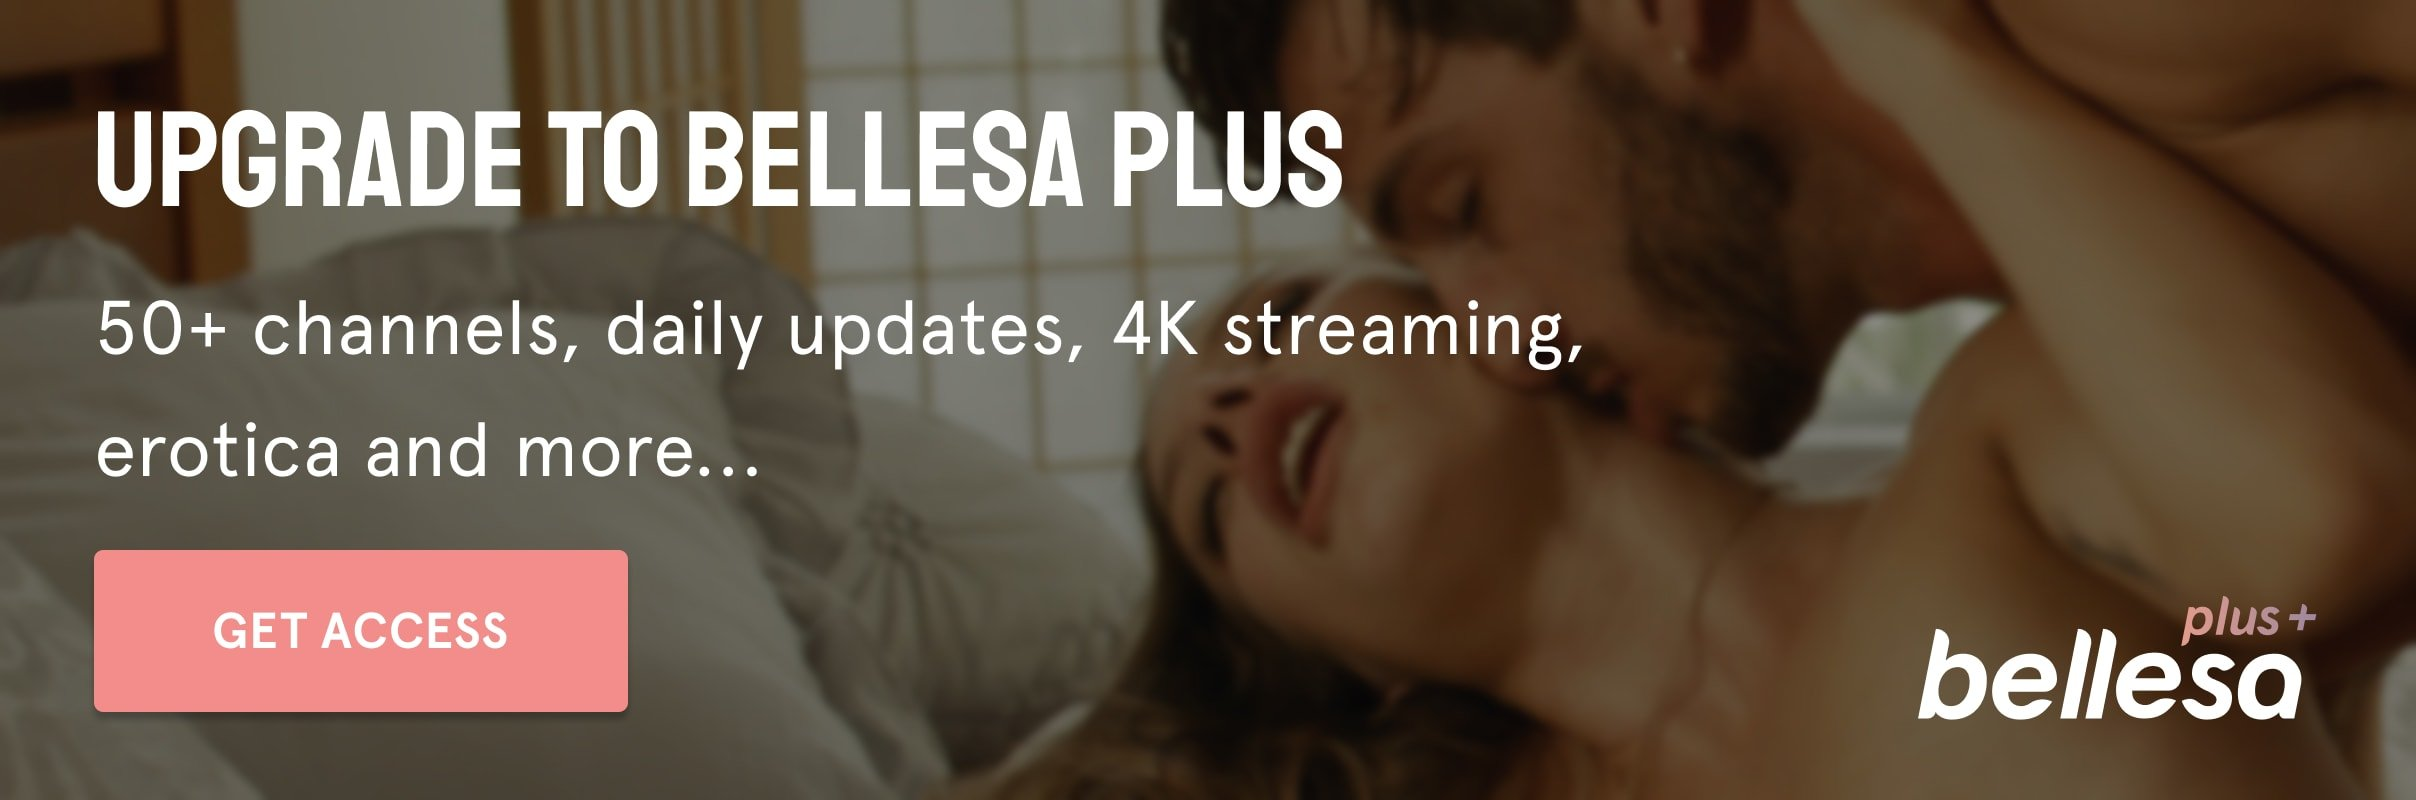 Bellesa Plus Search - Get Access